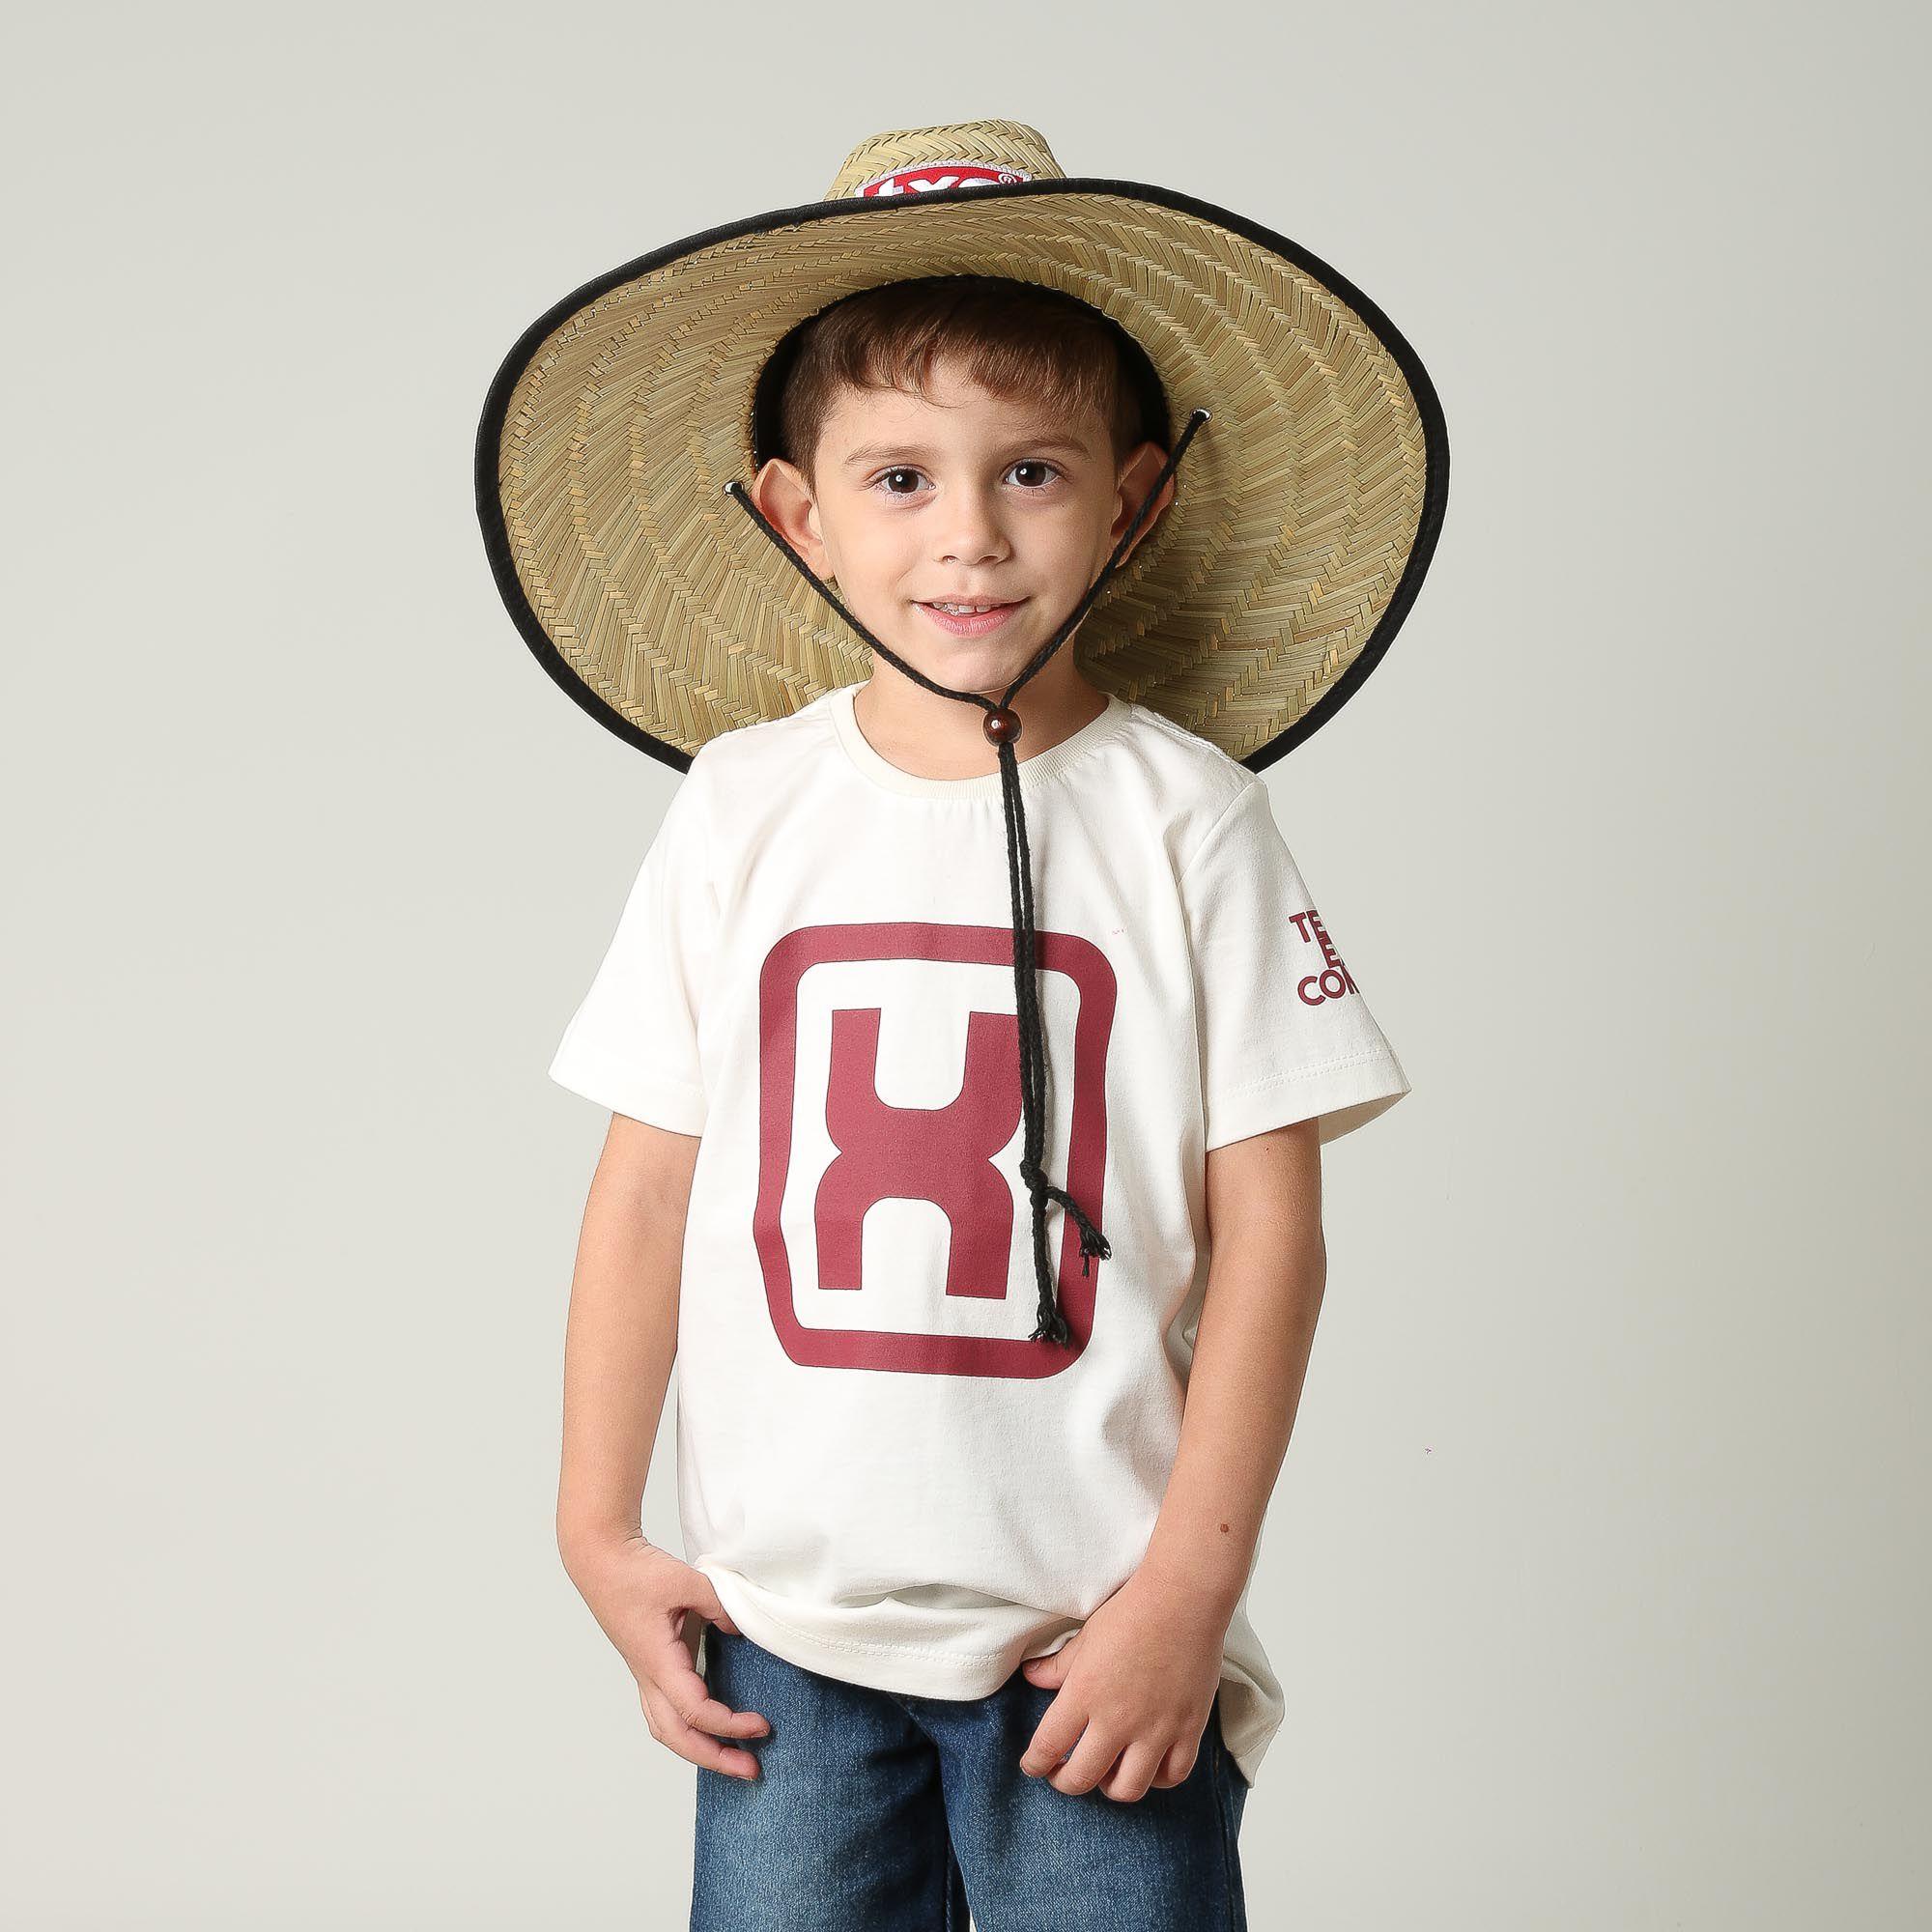 Camiseta Infantil TXC 14070I